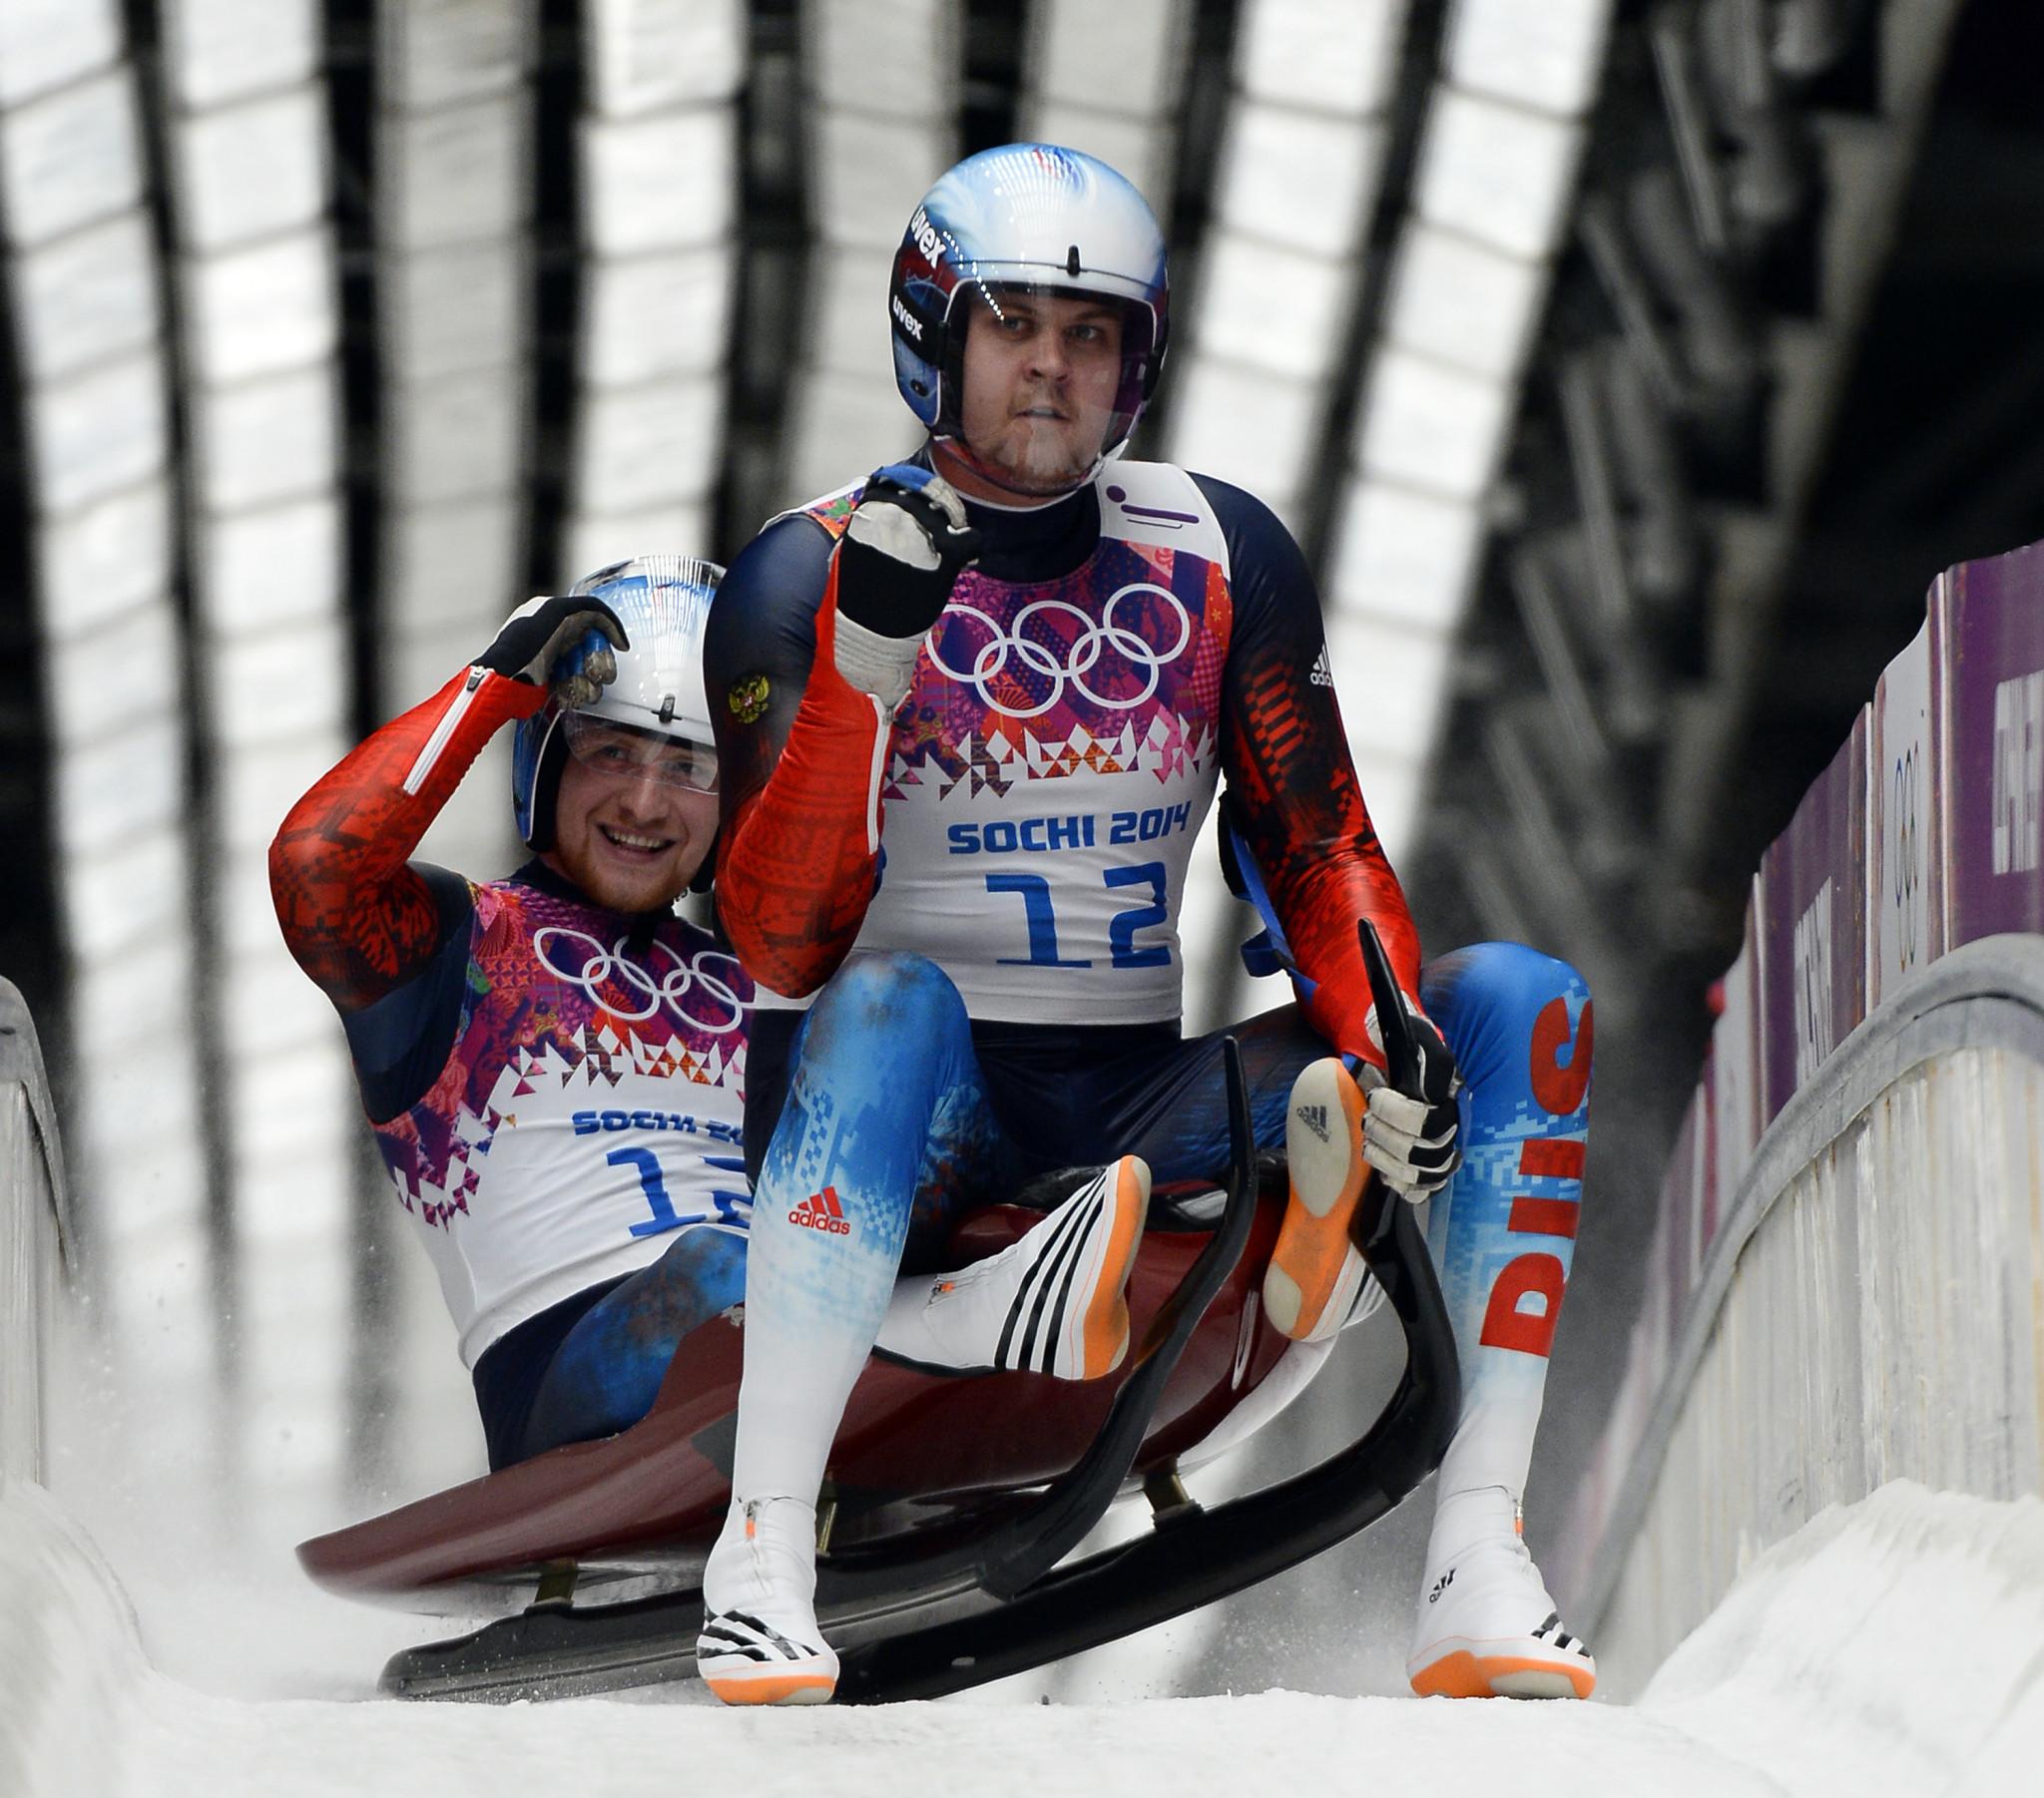 Vladislav Antonov and Alexander Denisiev were team relay silver medallists at Sochi 2014 ©Getty Images